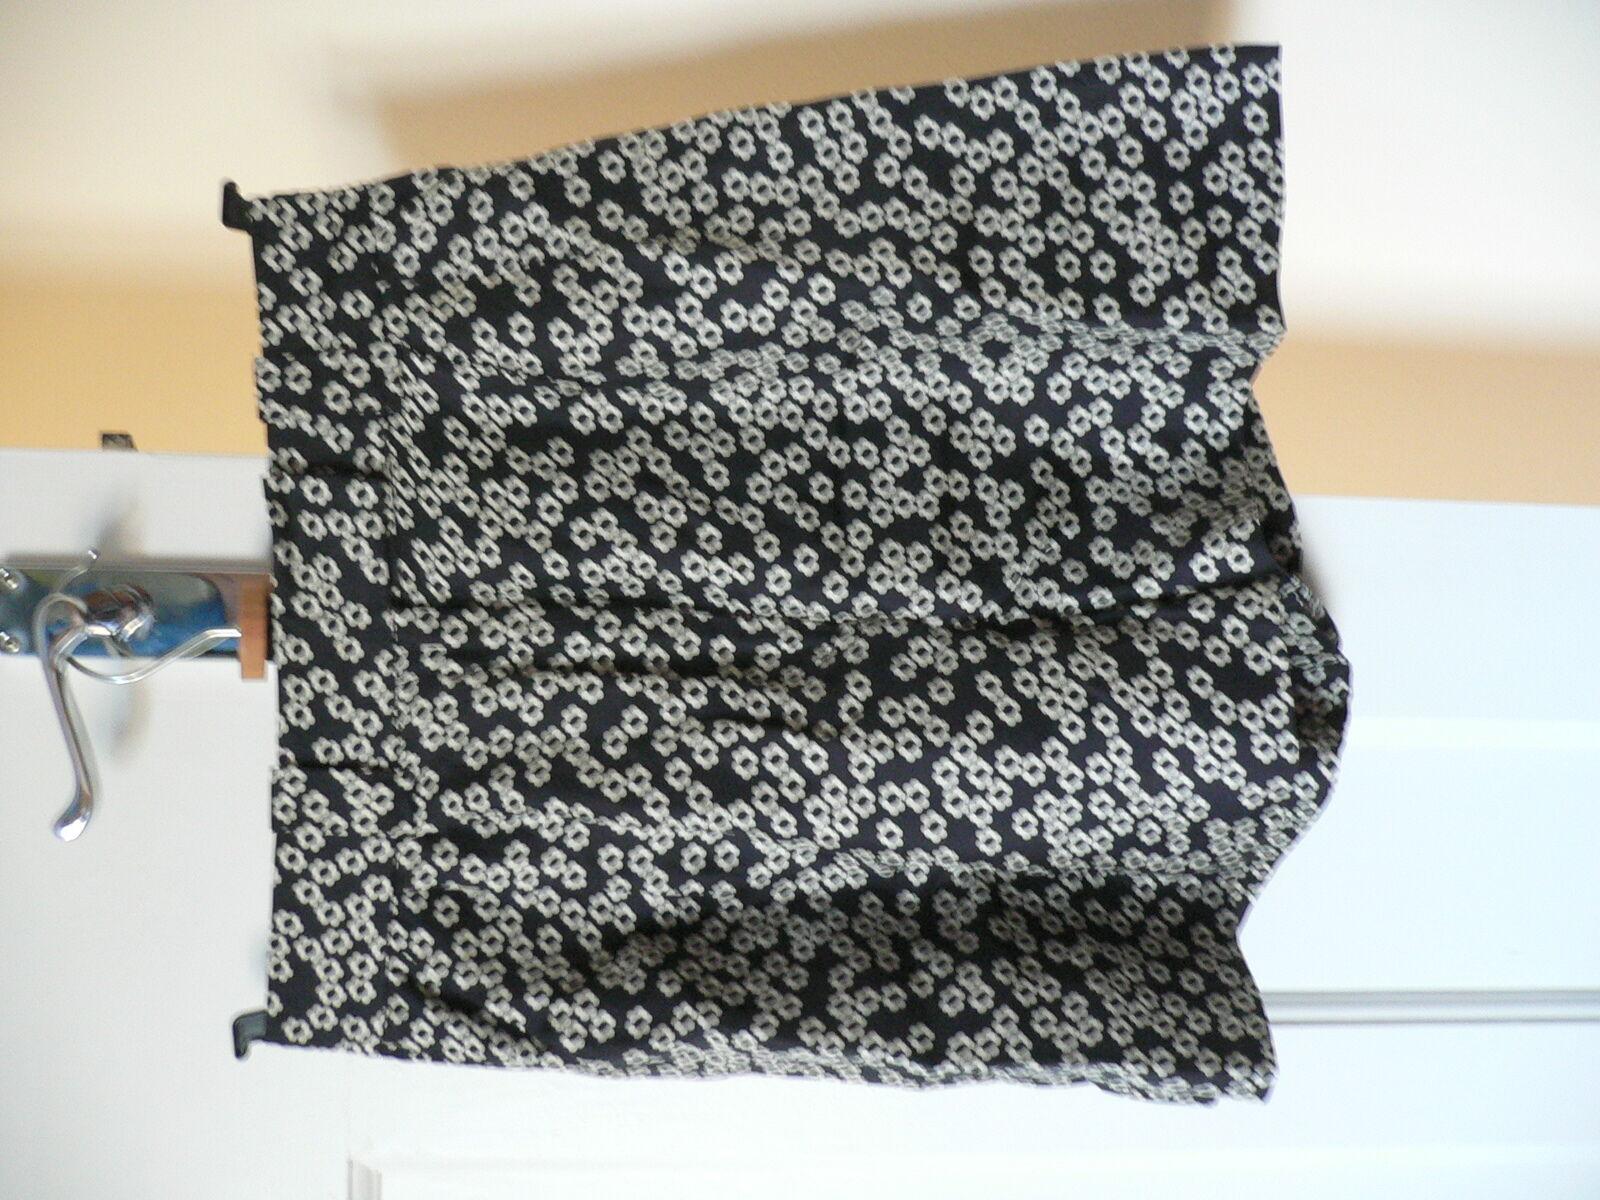 Orla Kiely Donna 100% 100% 100% Silk Shorts bianca Navy nero Floral used-1 621337